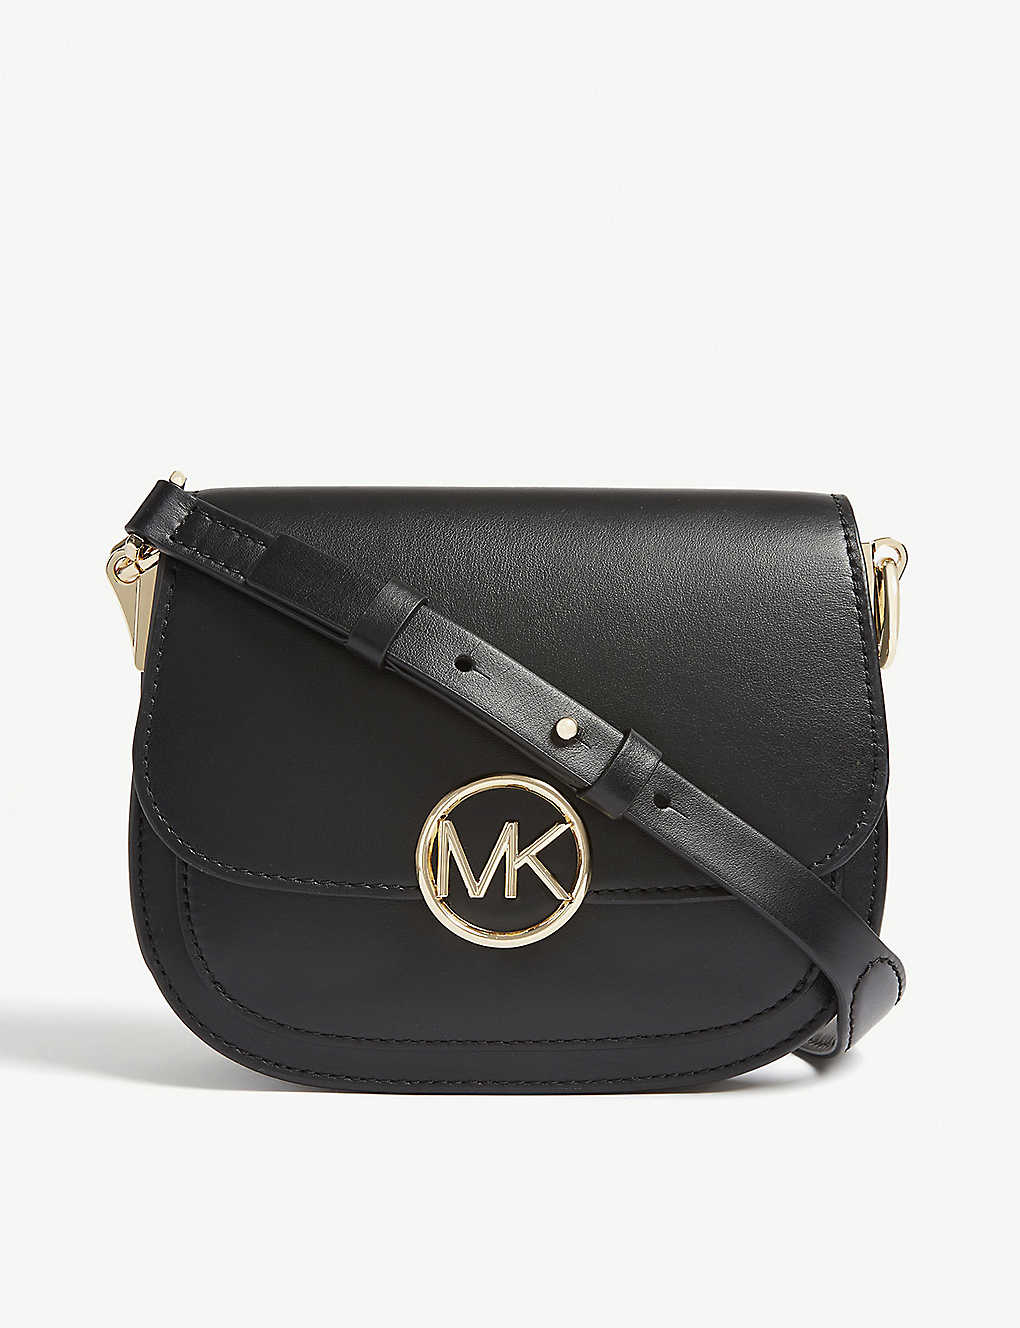 e2b0d8ab5009 MICHAEL MICHAEL KORS - Lillie small leather saddle bag